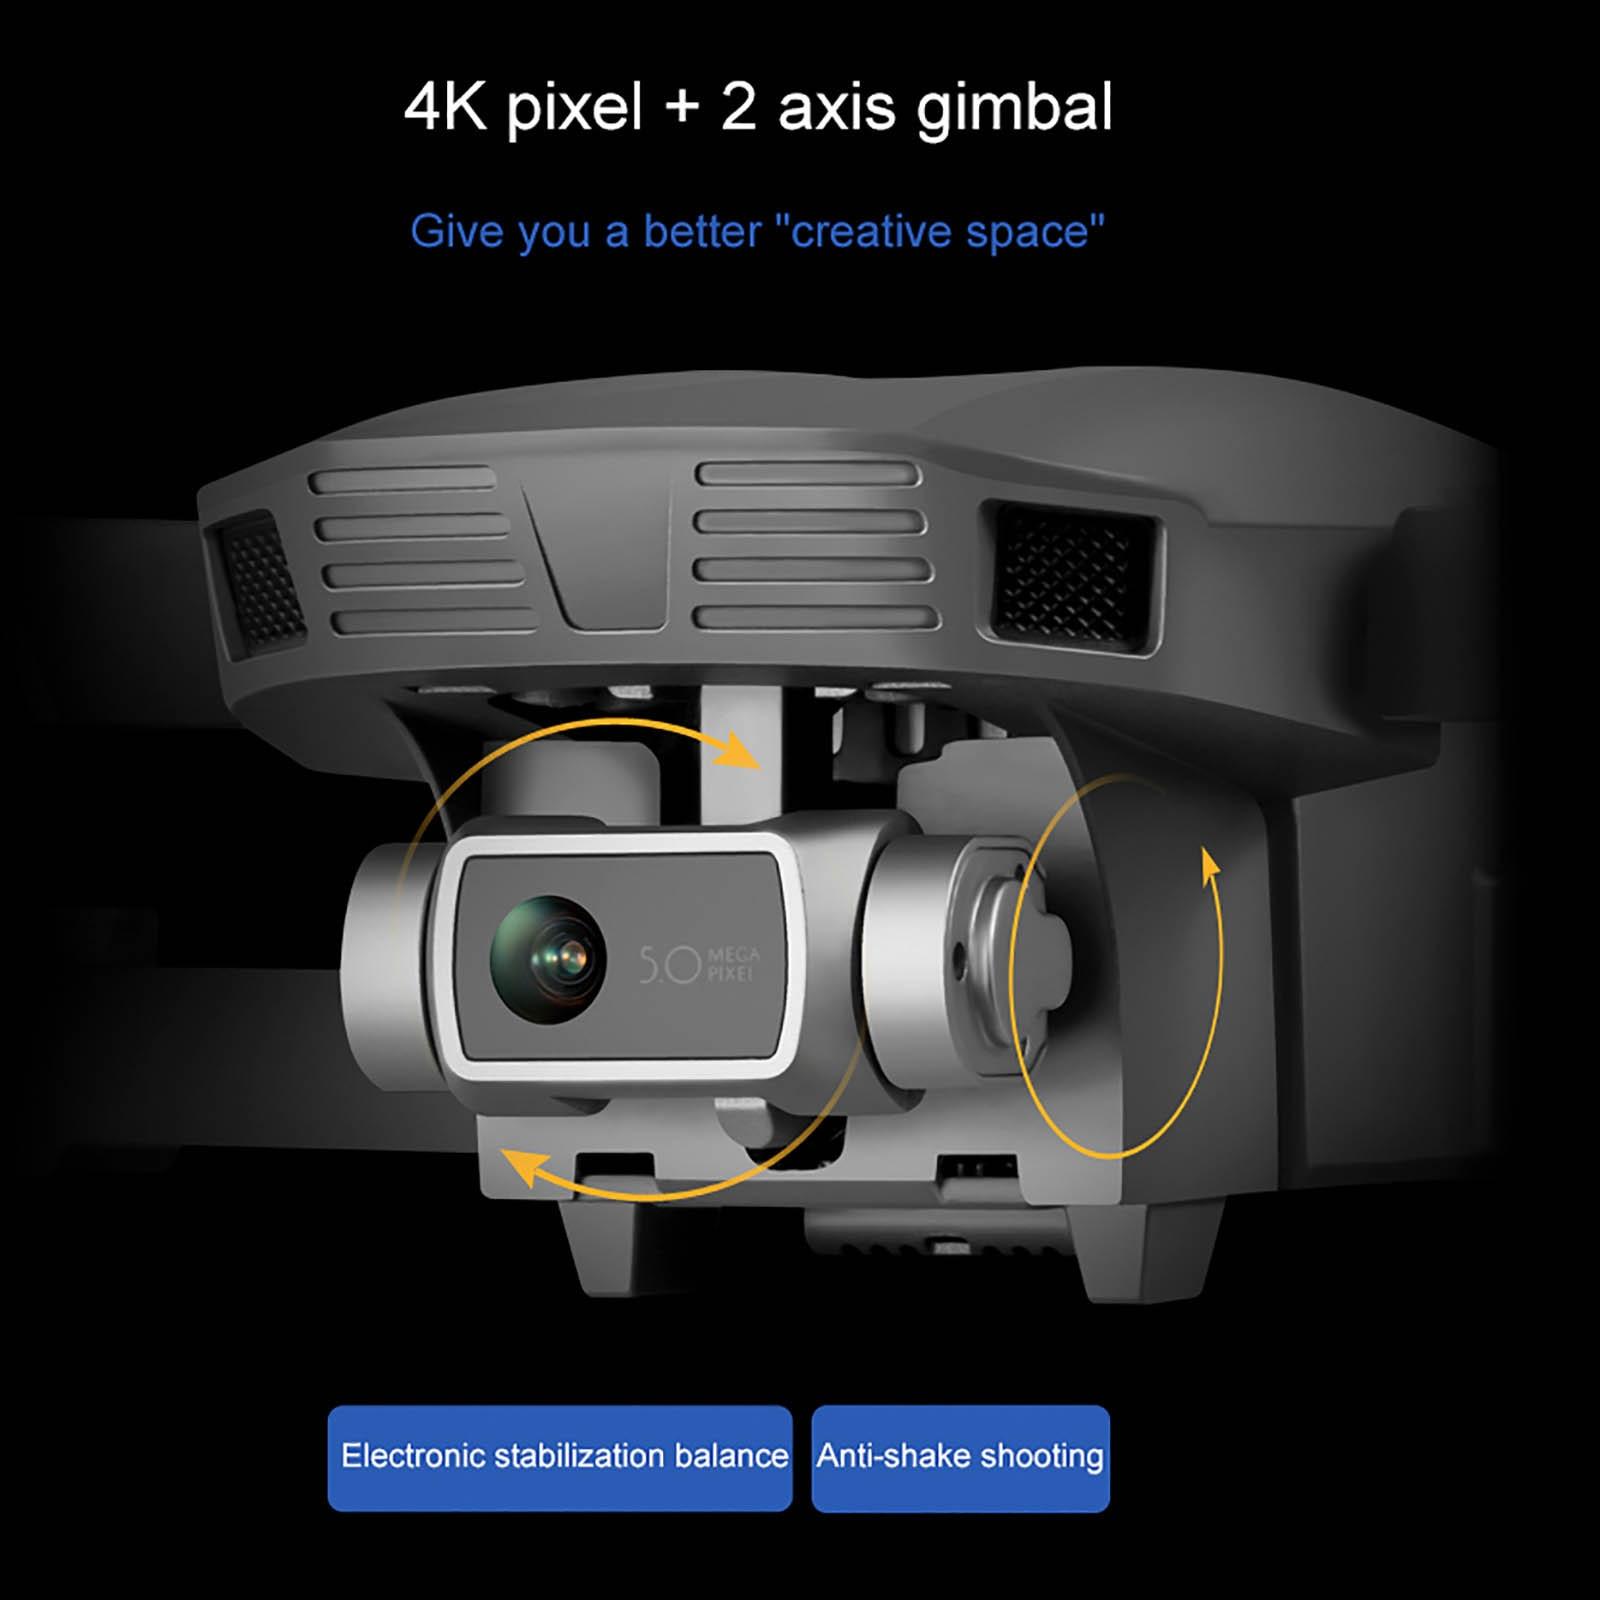 F4 Drone Gps 5g 4k Hd Mechanical